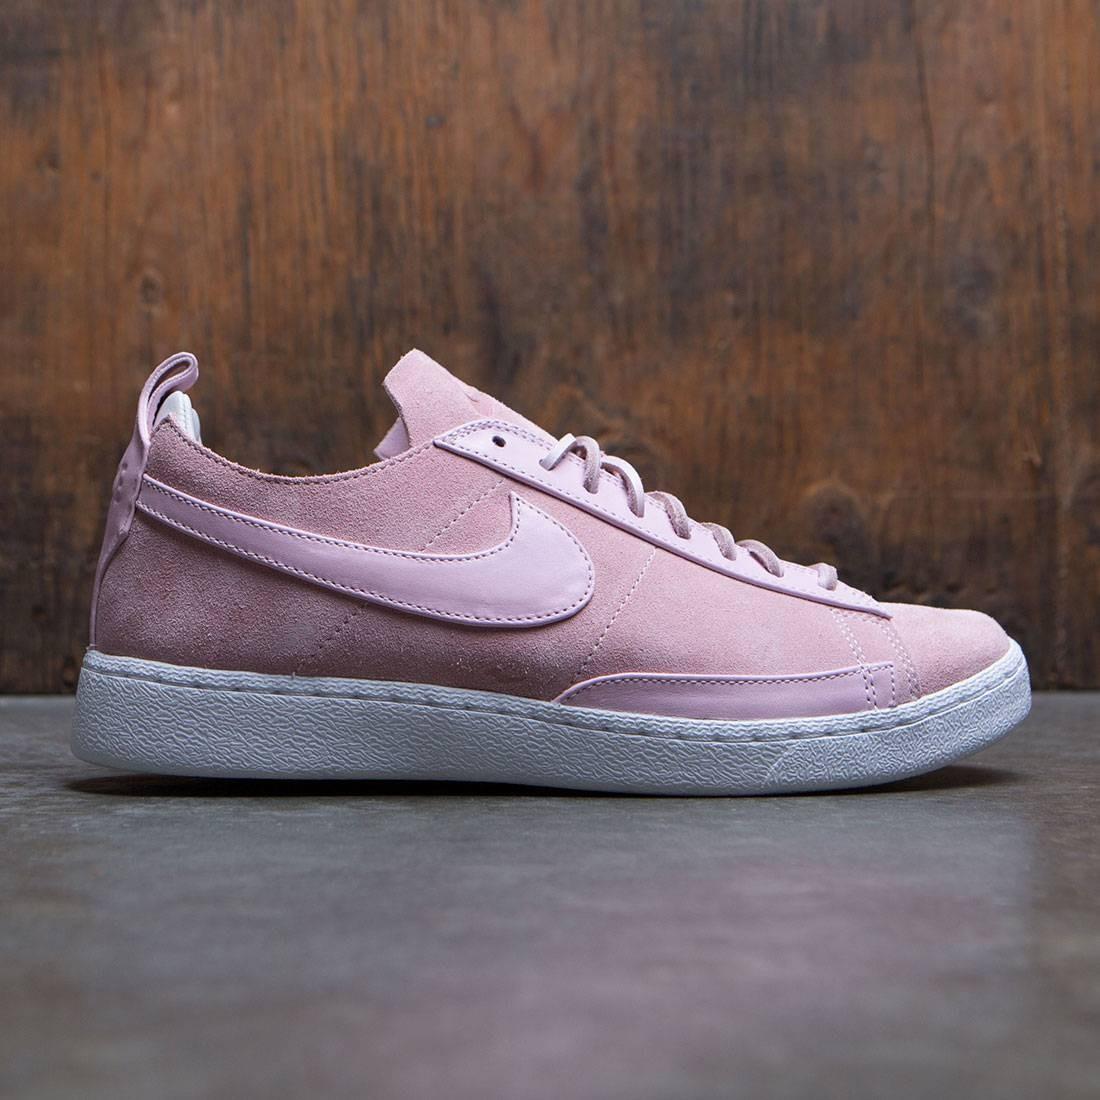 NikeLab Men Blazer Low Cs Tc Tech Craft (prism pink / whtie)